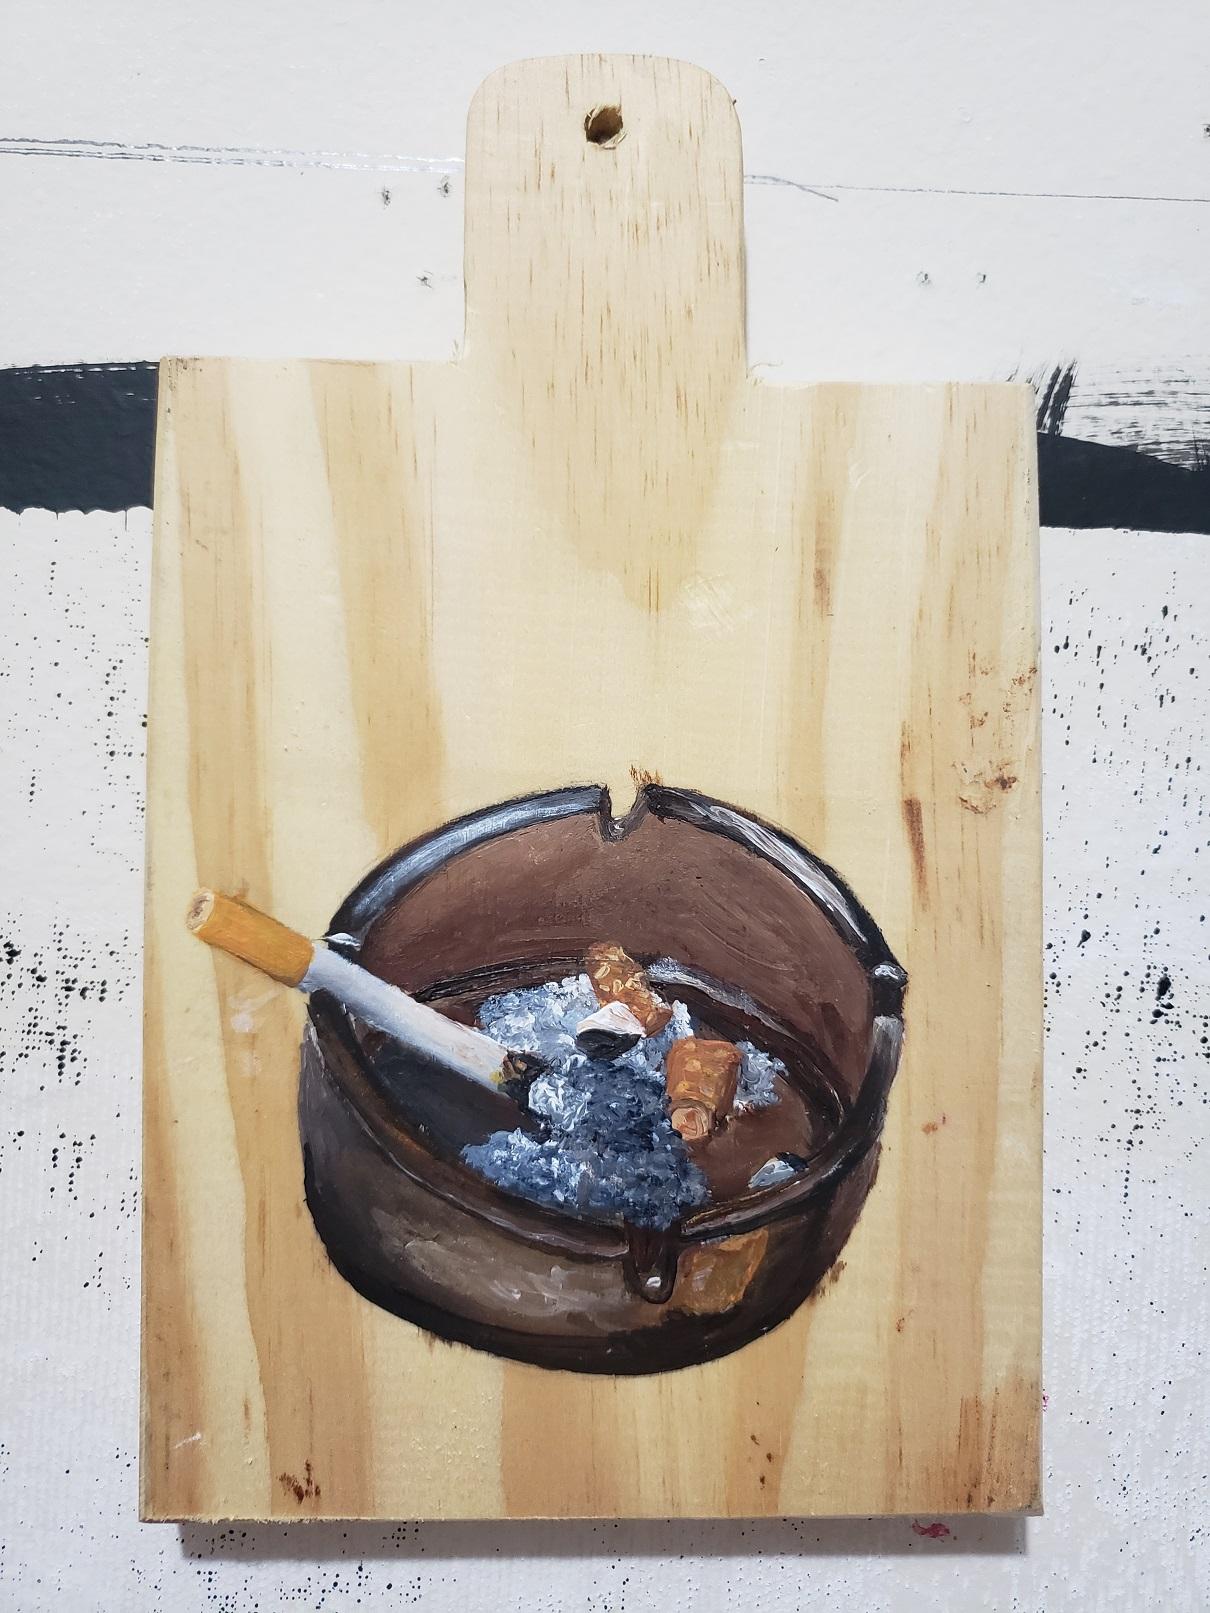 Julia Debasse, Dos Gardenias - Cinzeiro, Acrílica sobre tábua de carne, 24,5 x 14,5 x 2,5 cm, 2020